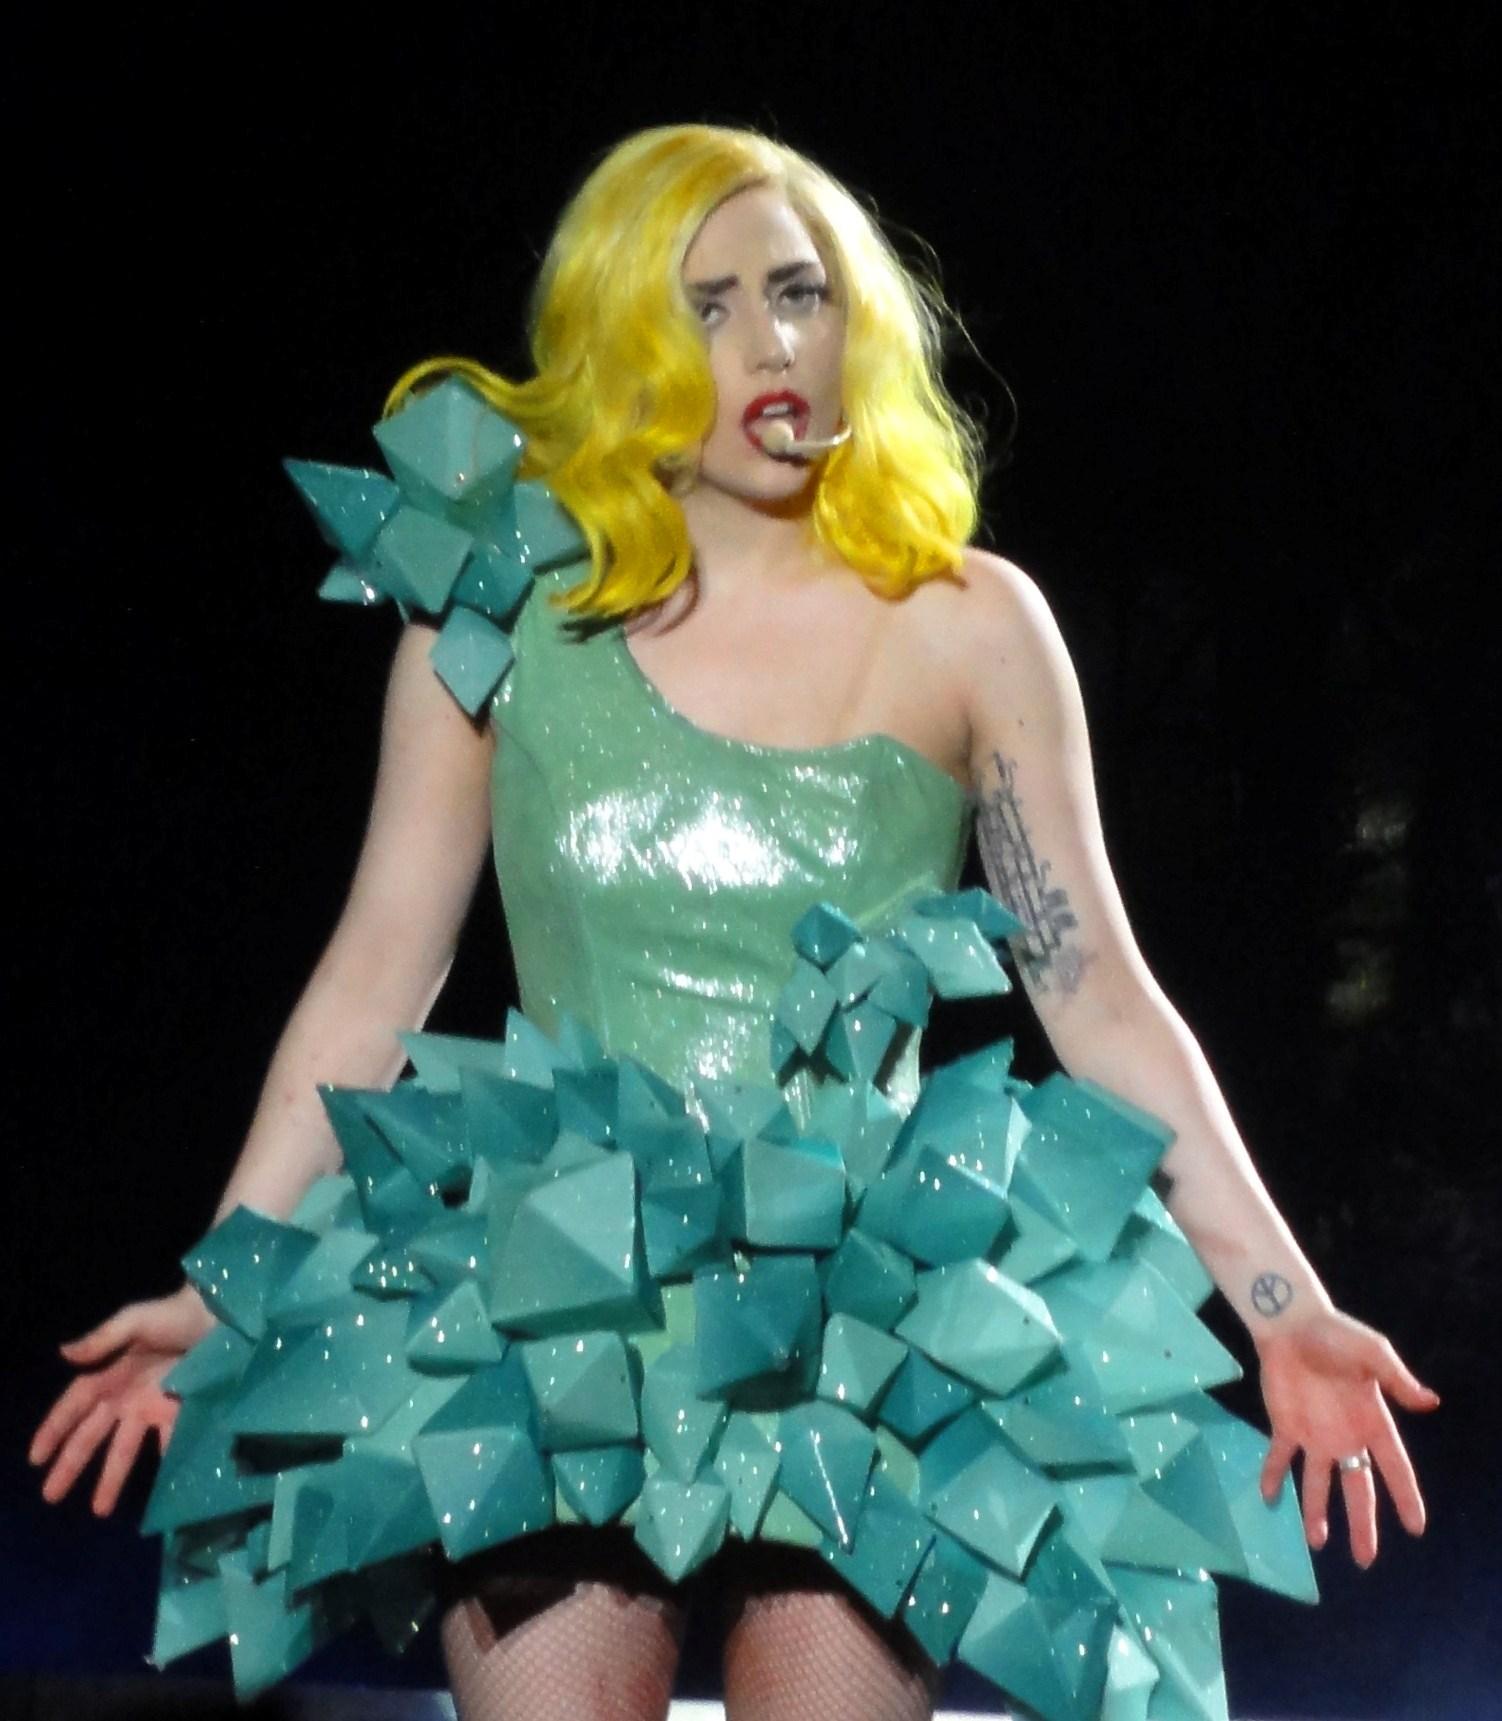 Lady_Gaga_Paparazzi.jpg